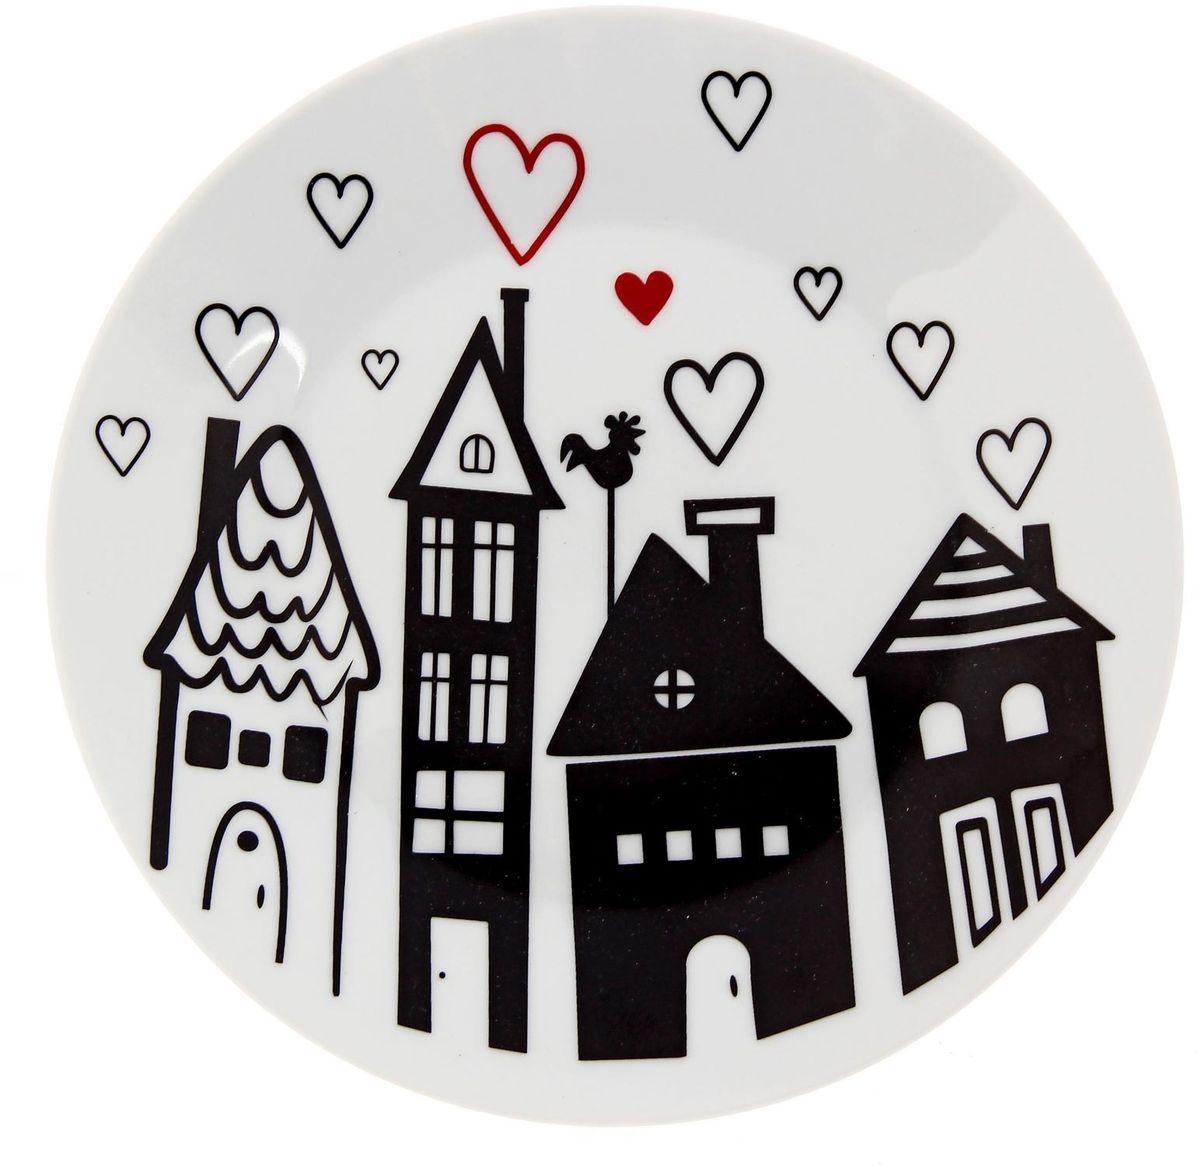 Тарелка мелкая Сотвори чудо Город любви, диаметр 20 см тарелка сотвори чудо киска диаметр 23 см